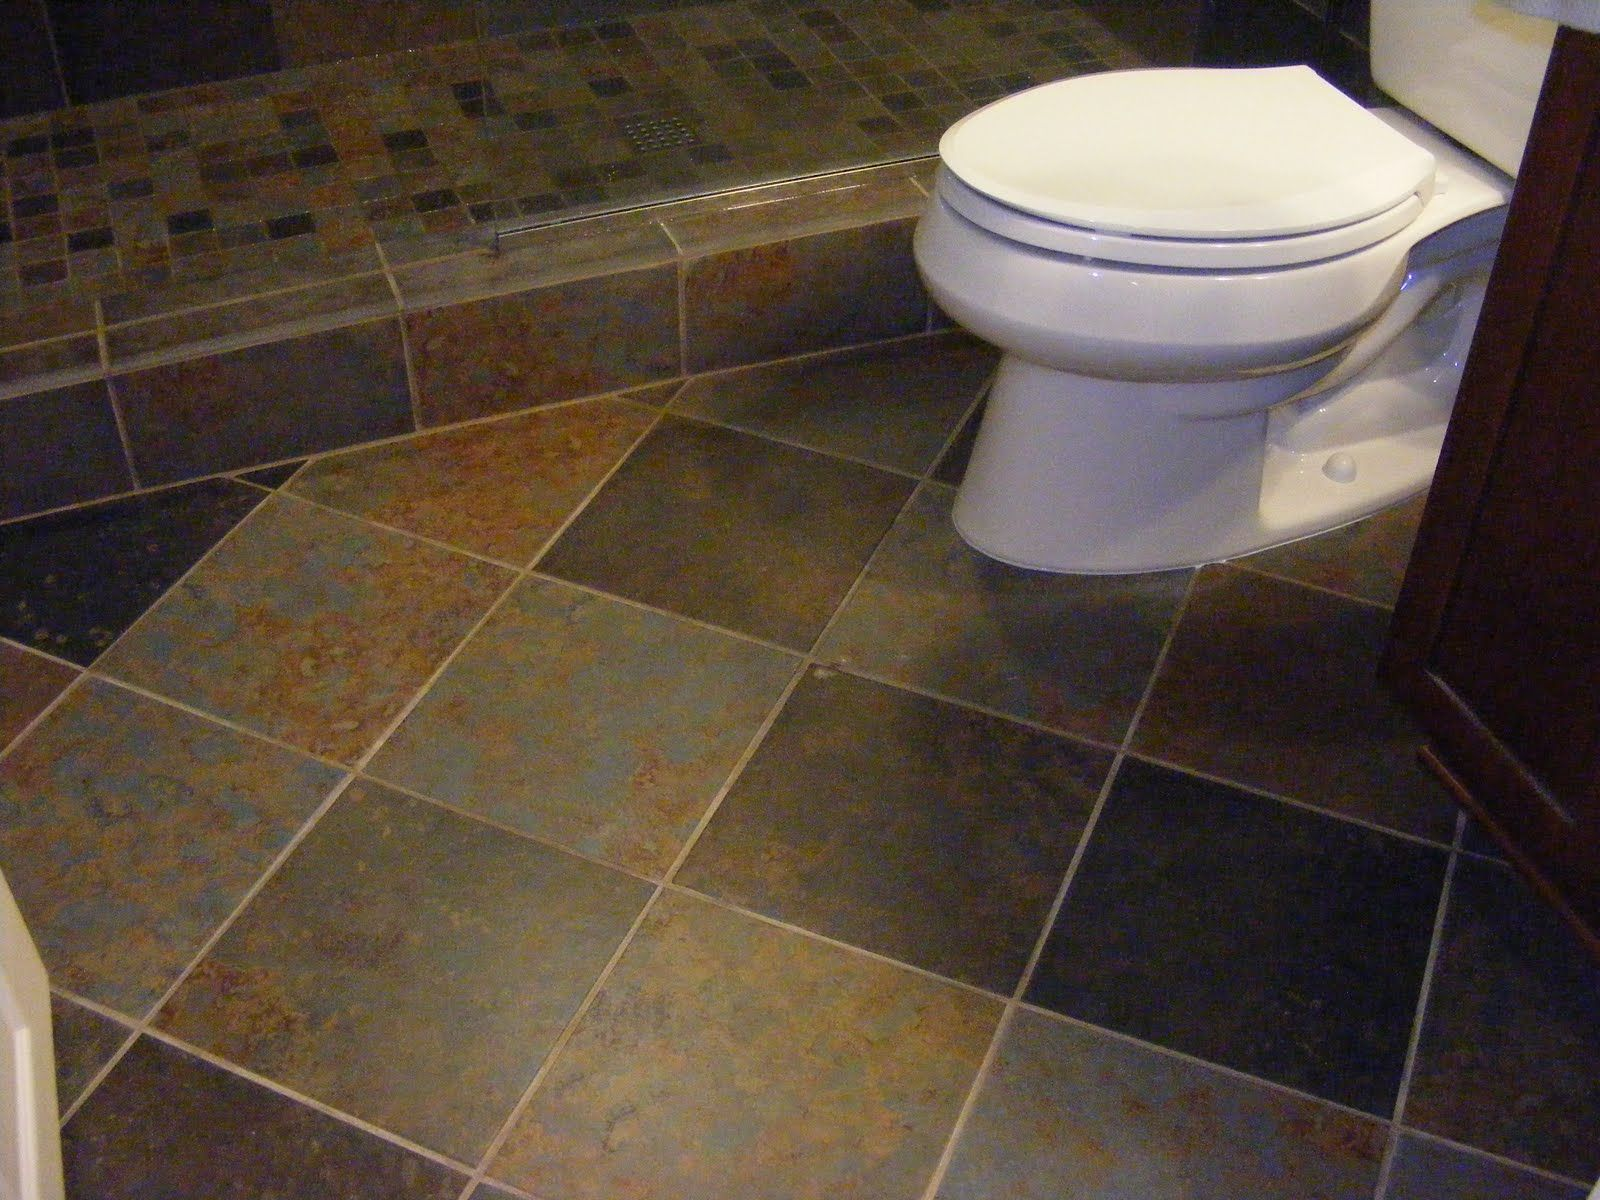 Bathroom floor tile floor tile 12 x 12 virginia tile slate multi bathroom floor tile floor tile 12 x 12 virginia tile slate multi color dailygadgetfo Images